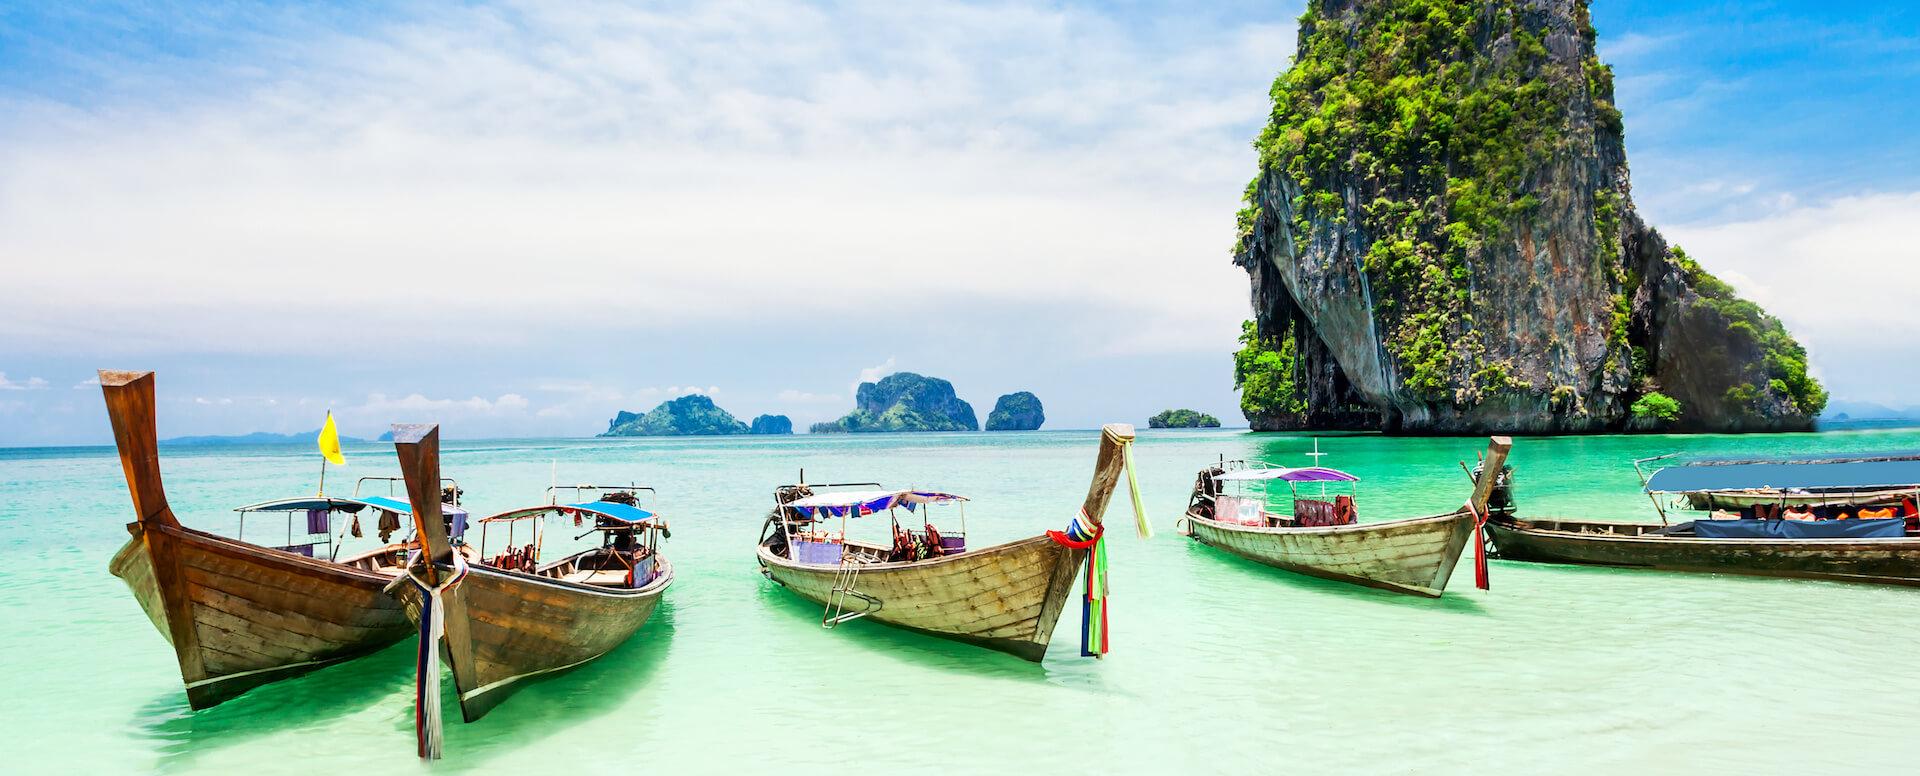 Long beach - Koh Phi Phi Don - Thailand